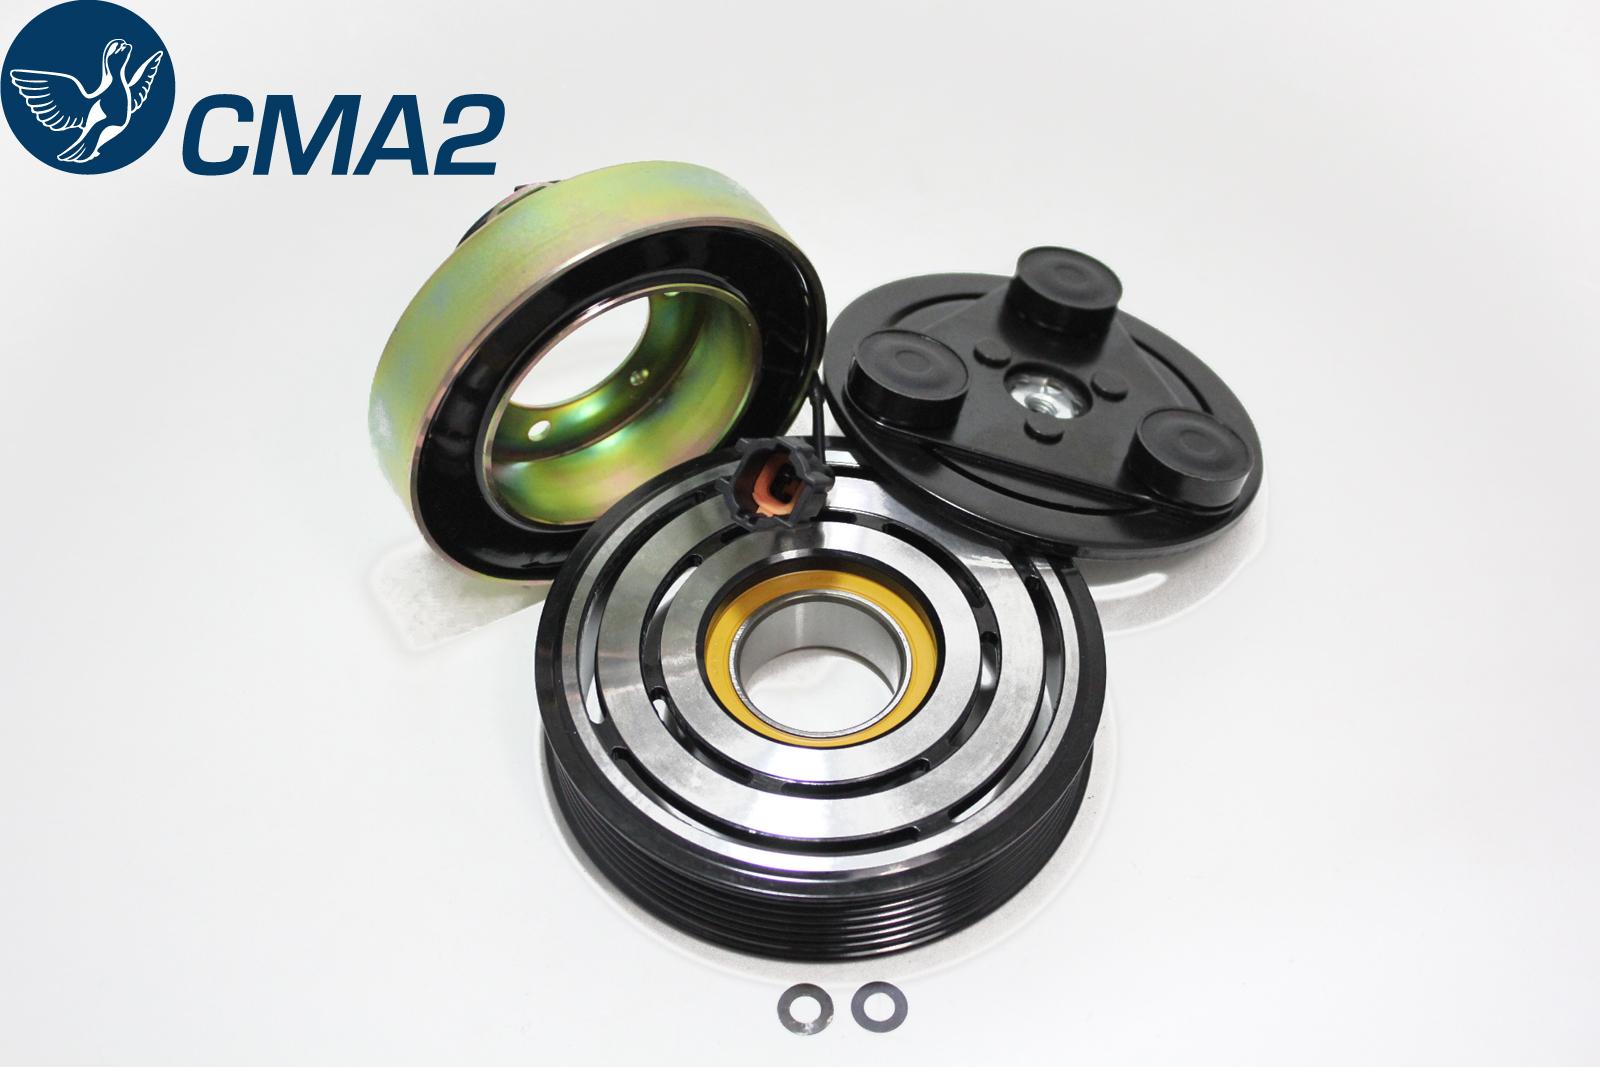 Муфта компрессора кондиционера Ниссан Теана J31, Ниссан Мурано Z50, 92660-CA01C, 92660-CA01A, 92660-CA010, 92660CA01C, 92660CA01A, 92660CA010.